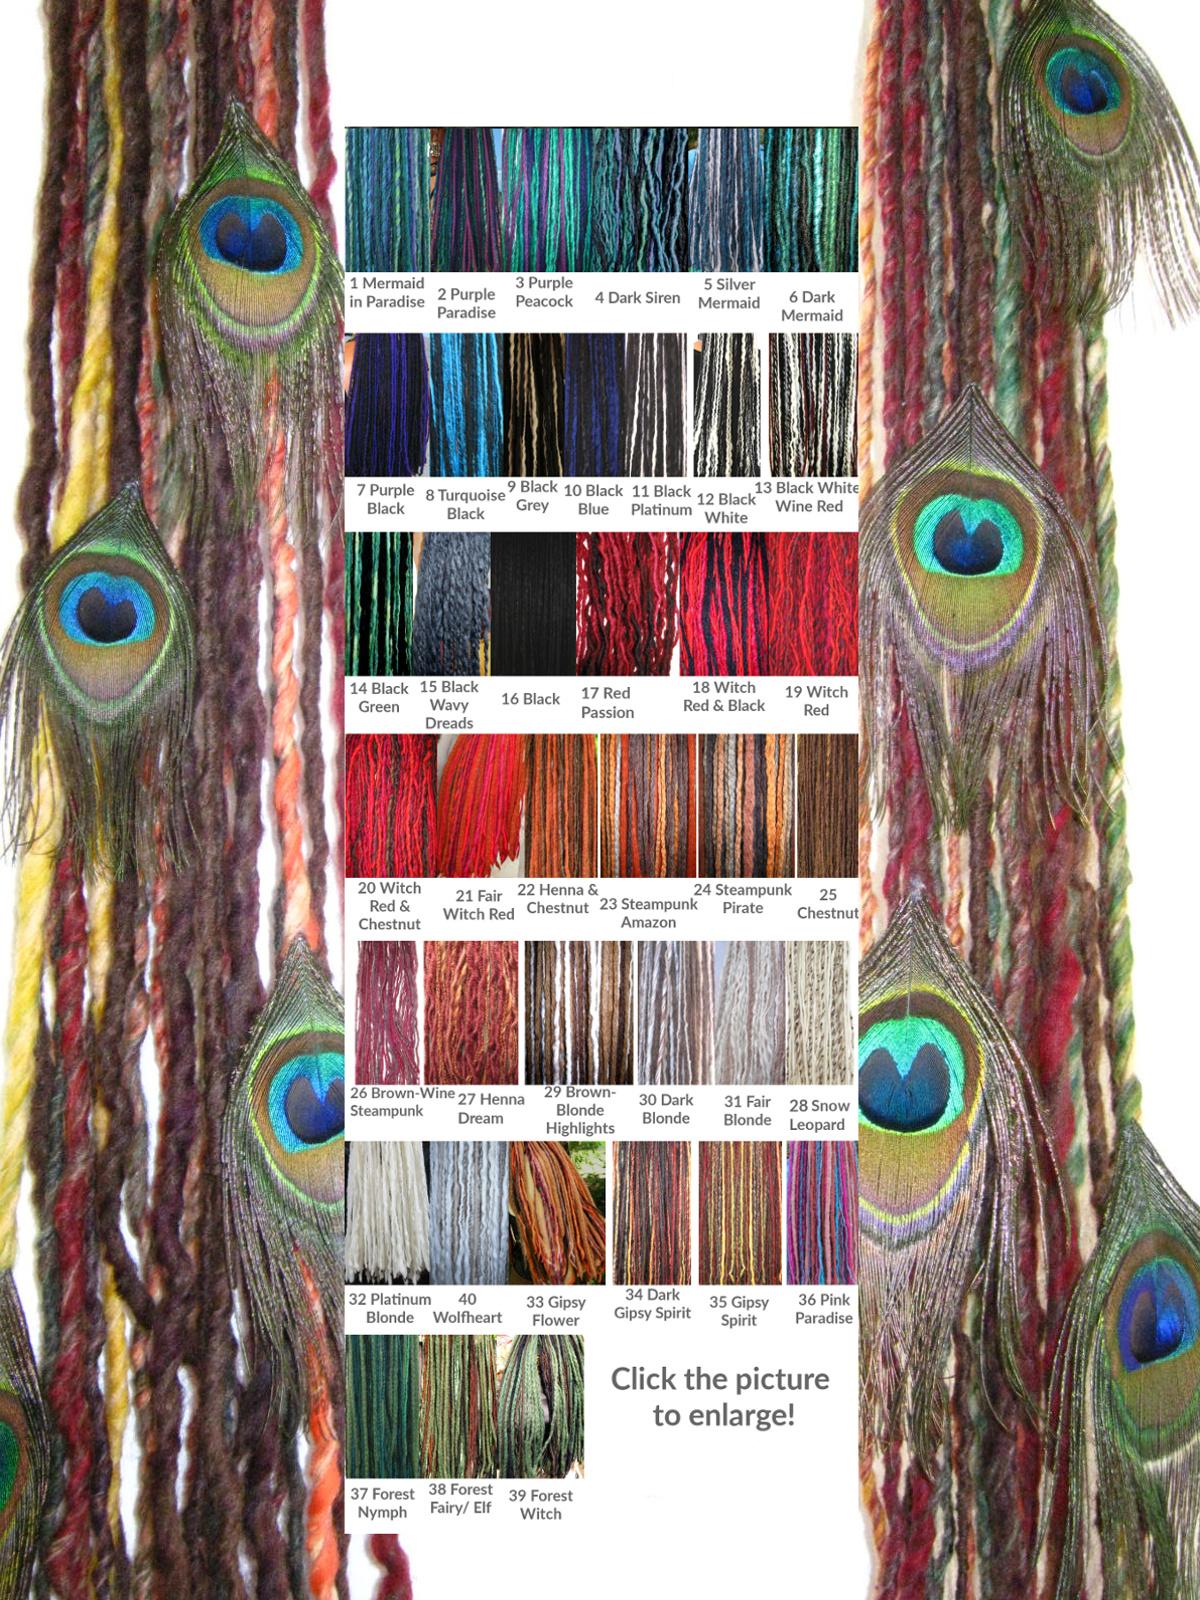 Dreadlocks Clip Ins With Peacock Feathers Magic Tribal Hair Magic Tribal Hair Schlegel Str 30 50935 Cologne Germany